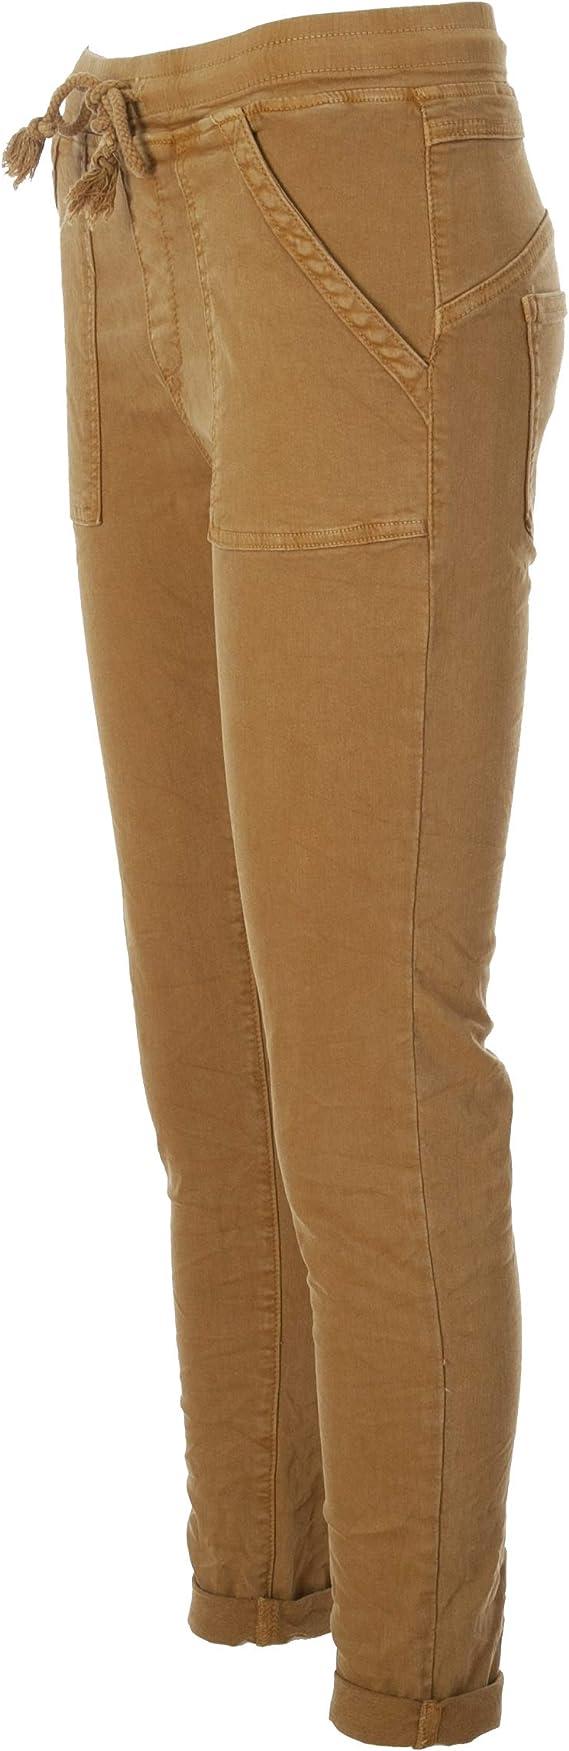 Pantalones para mujer con bolsillos laterales Basic.de Melly /& CO 8186